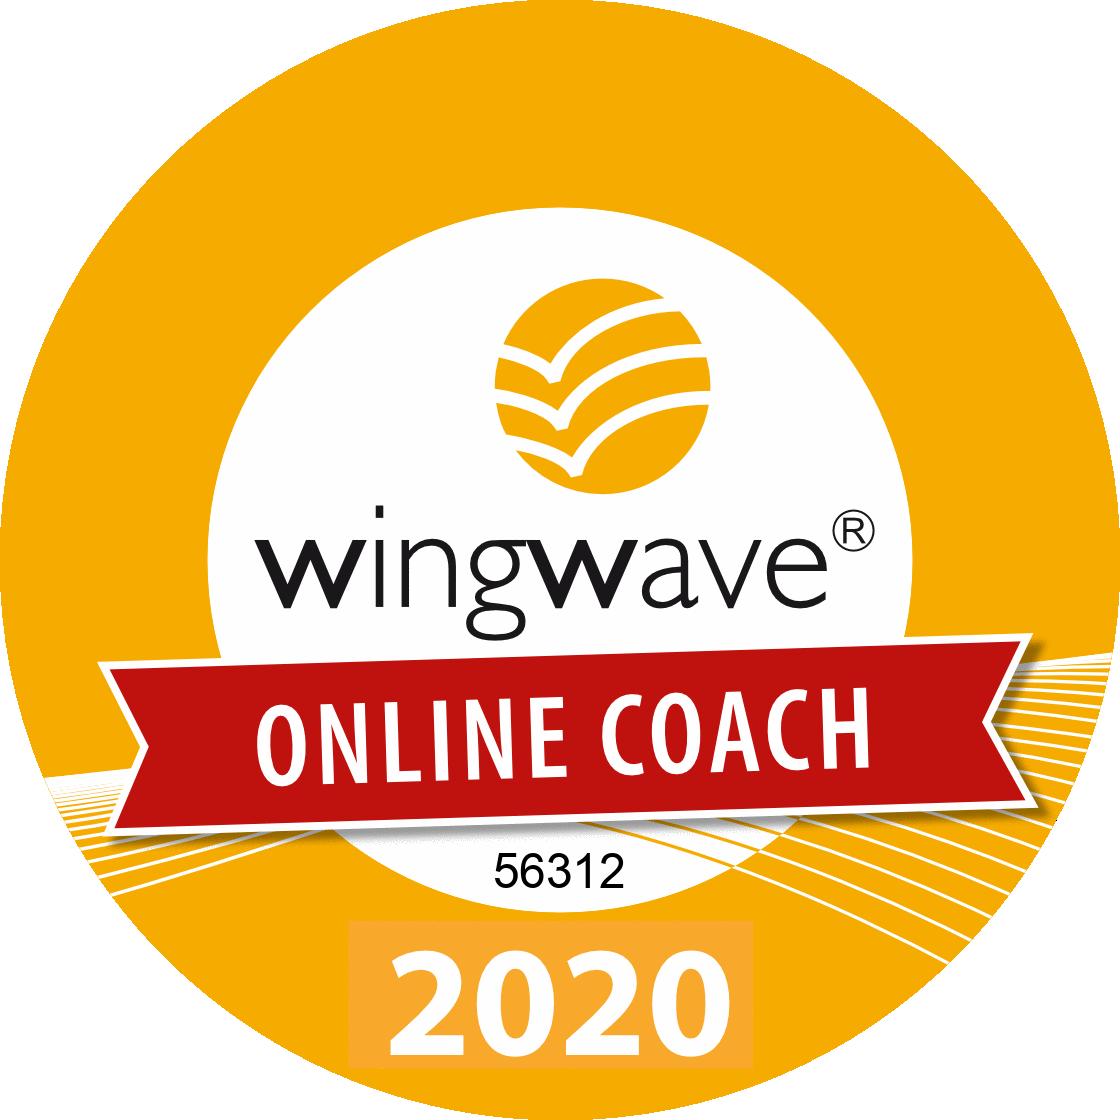 Sello de Calidad Coach Online wingwave®'20 nº 56312